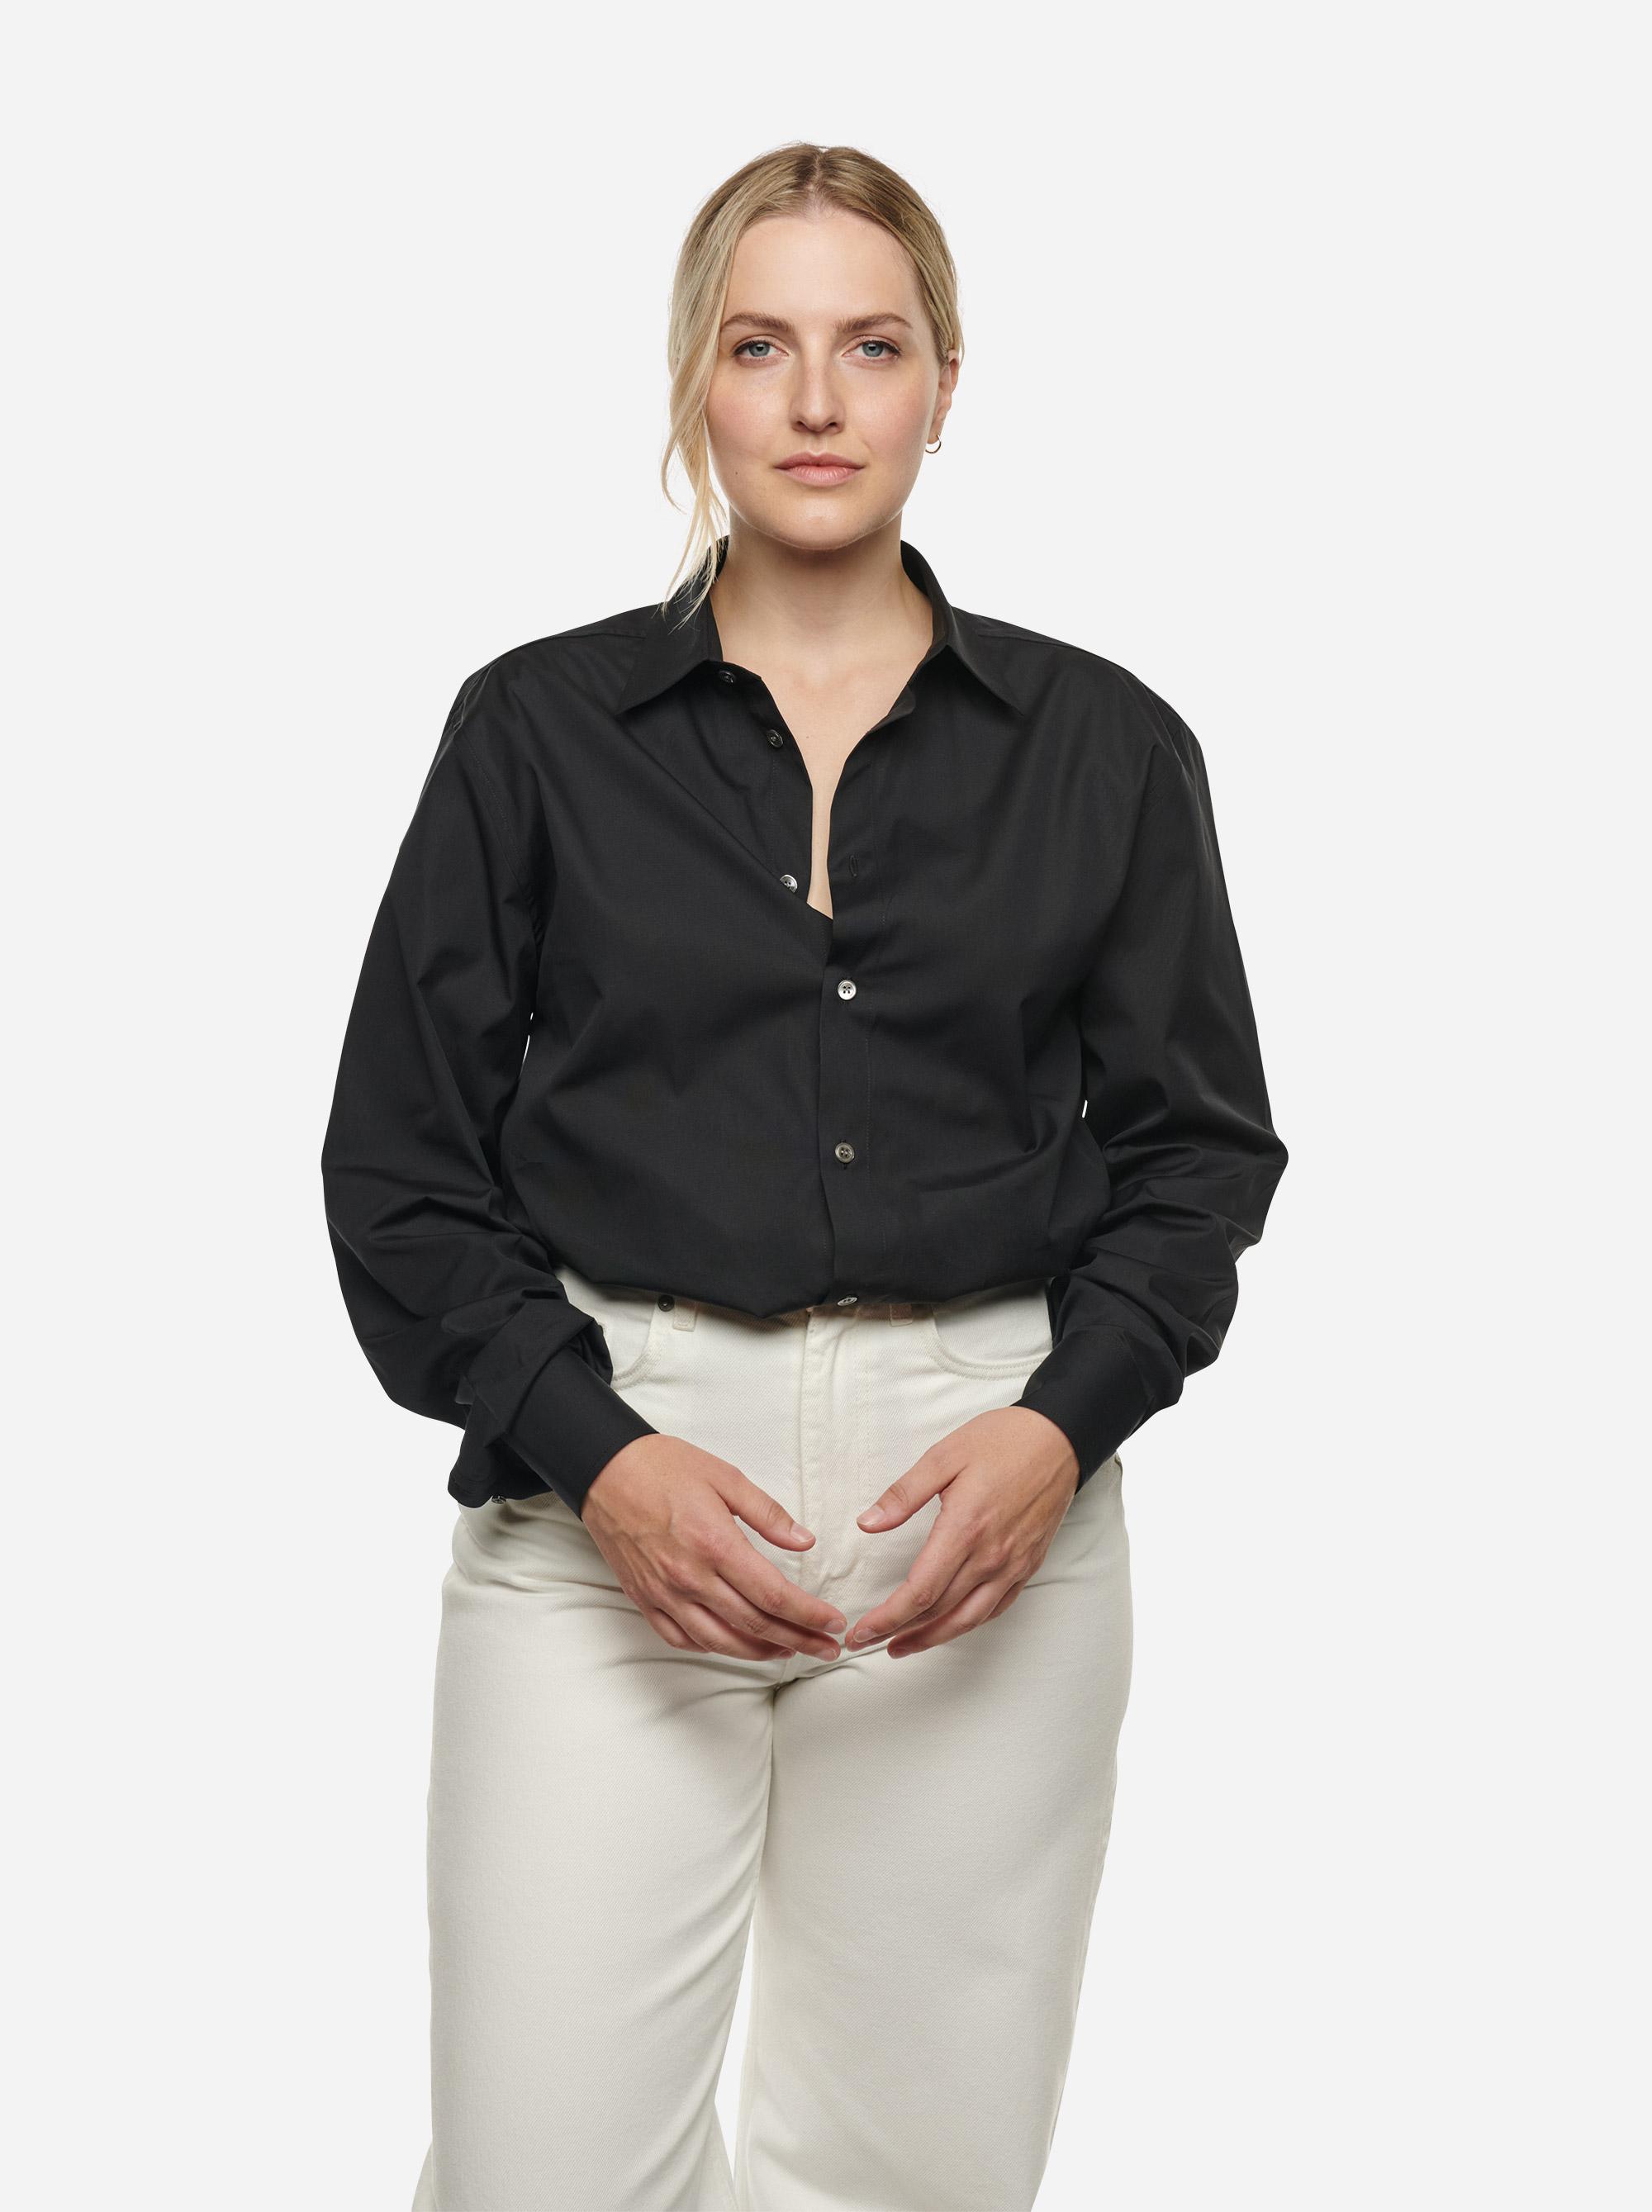 Teym-Shirt-Black-women-mens5